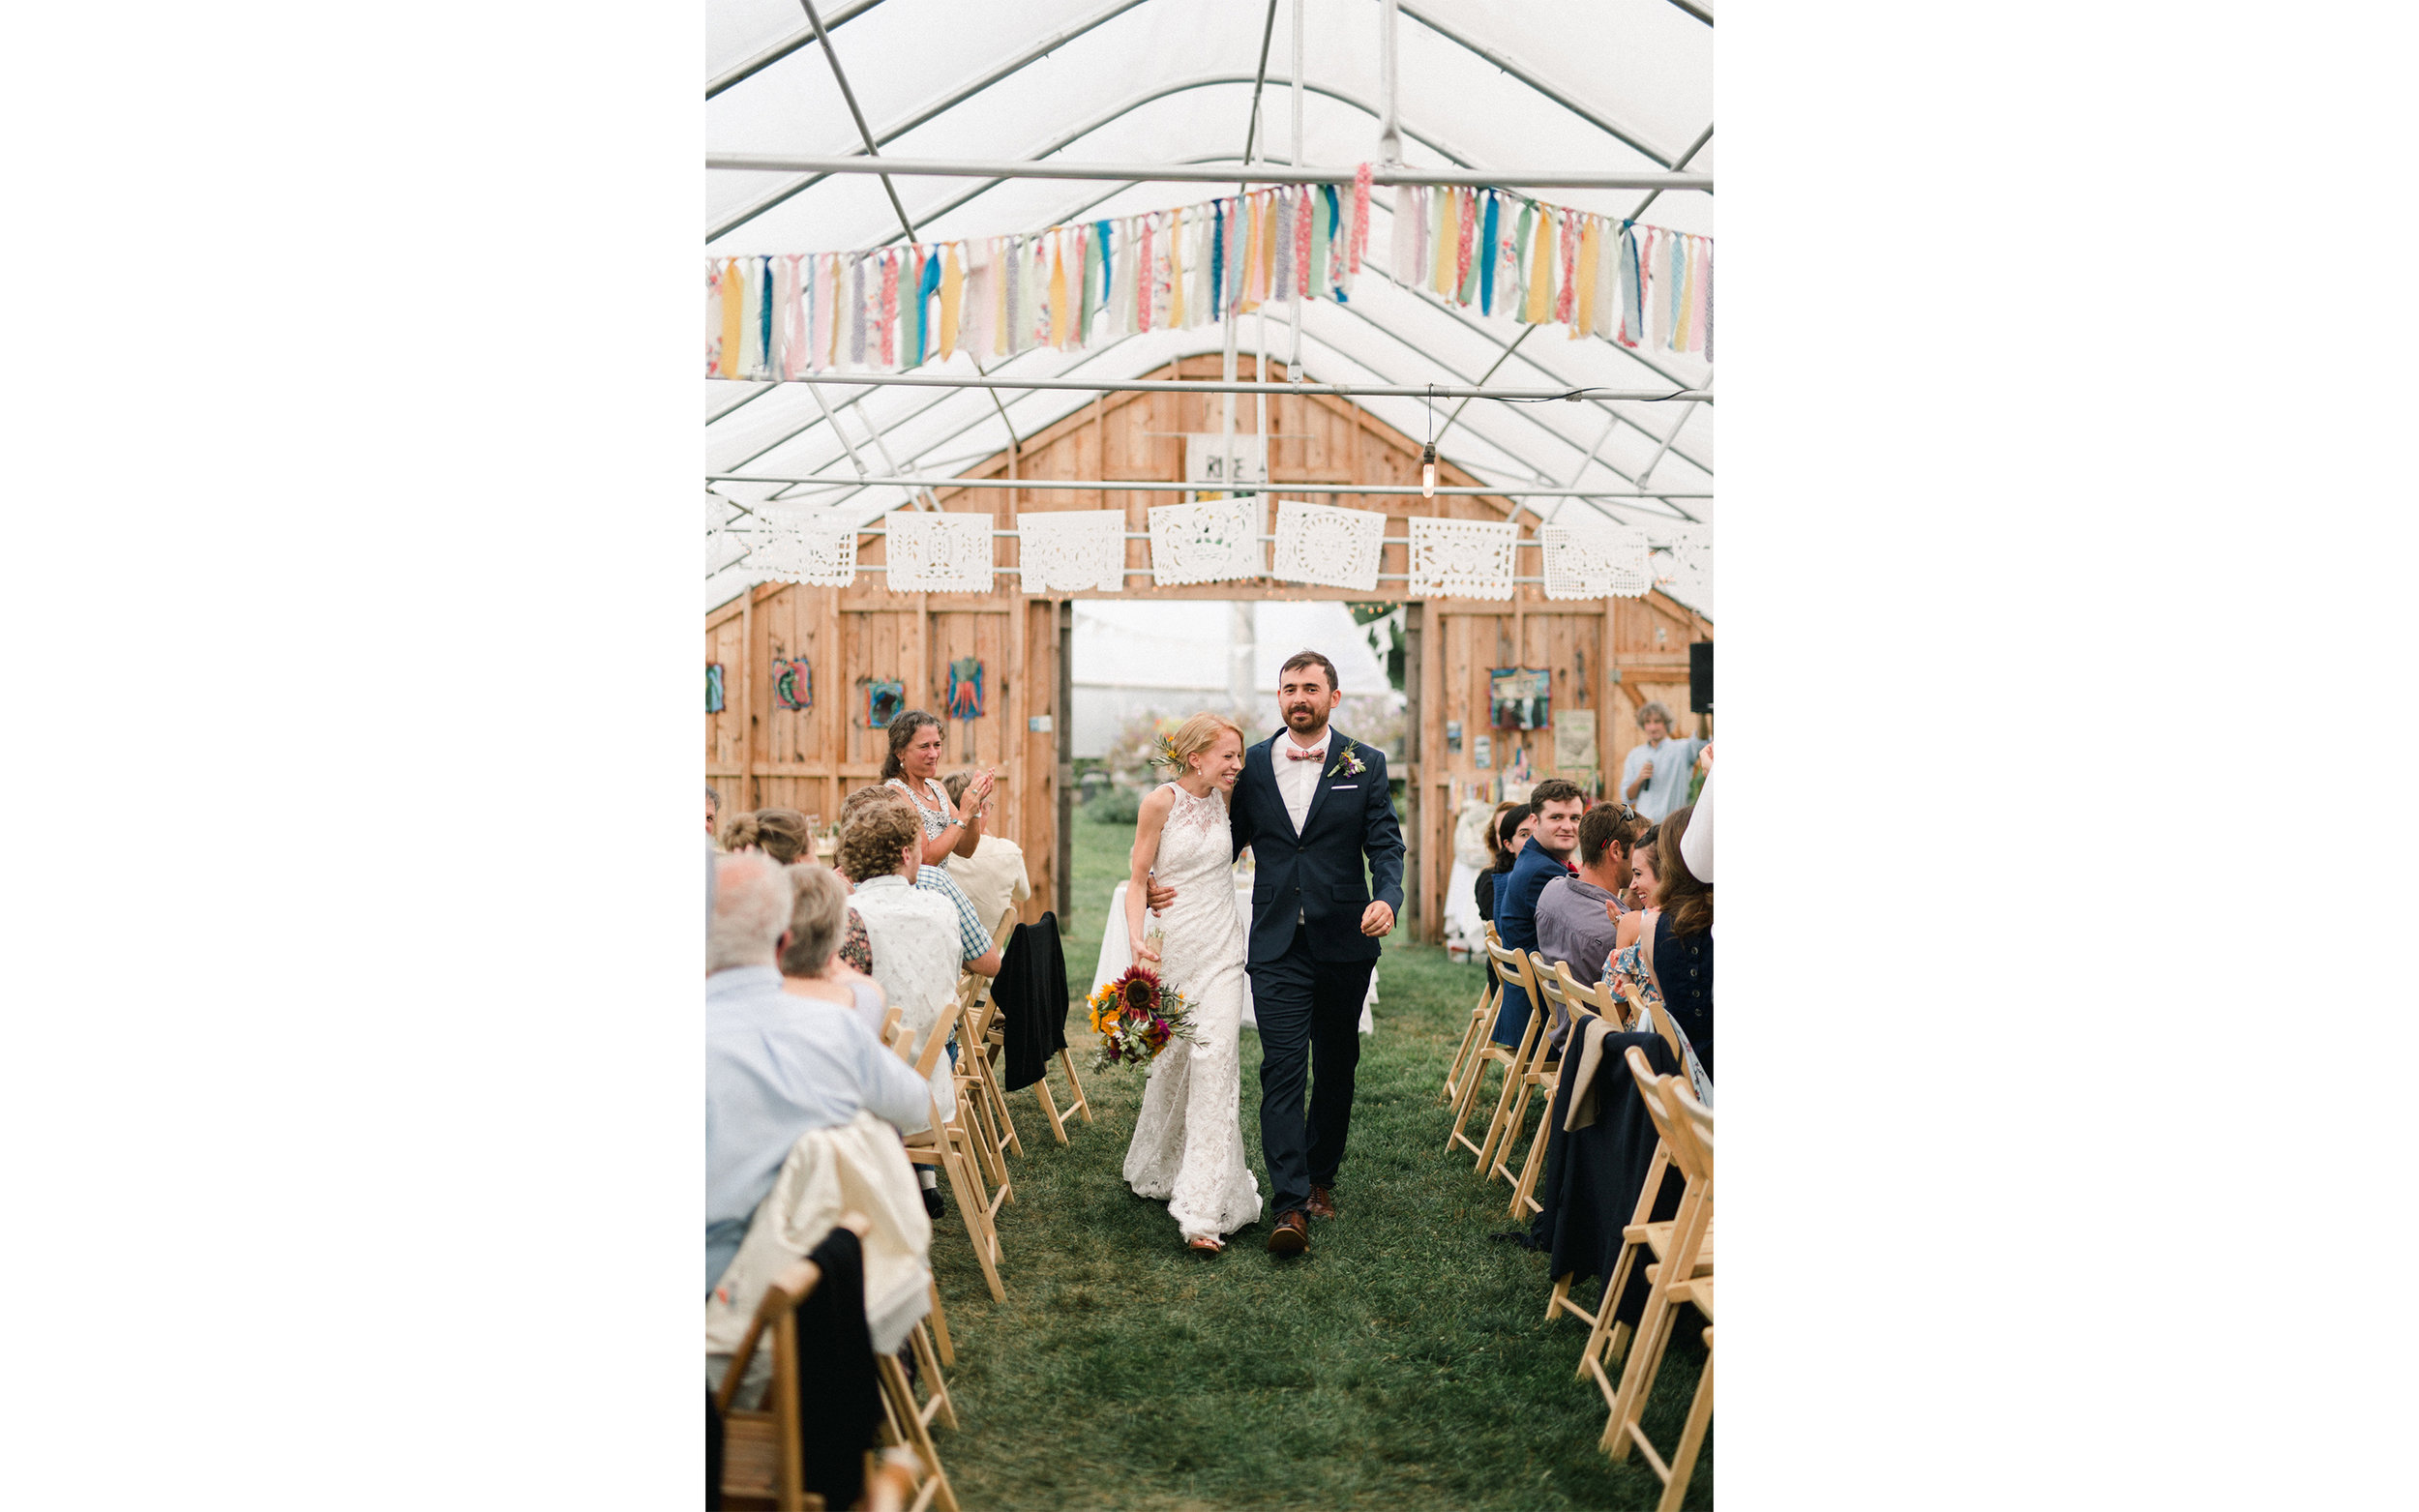 Stowe VT Farm Wedding Fine Art Wedding Photographer_Meg Haley Photographs_044.jpg